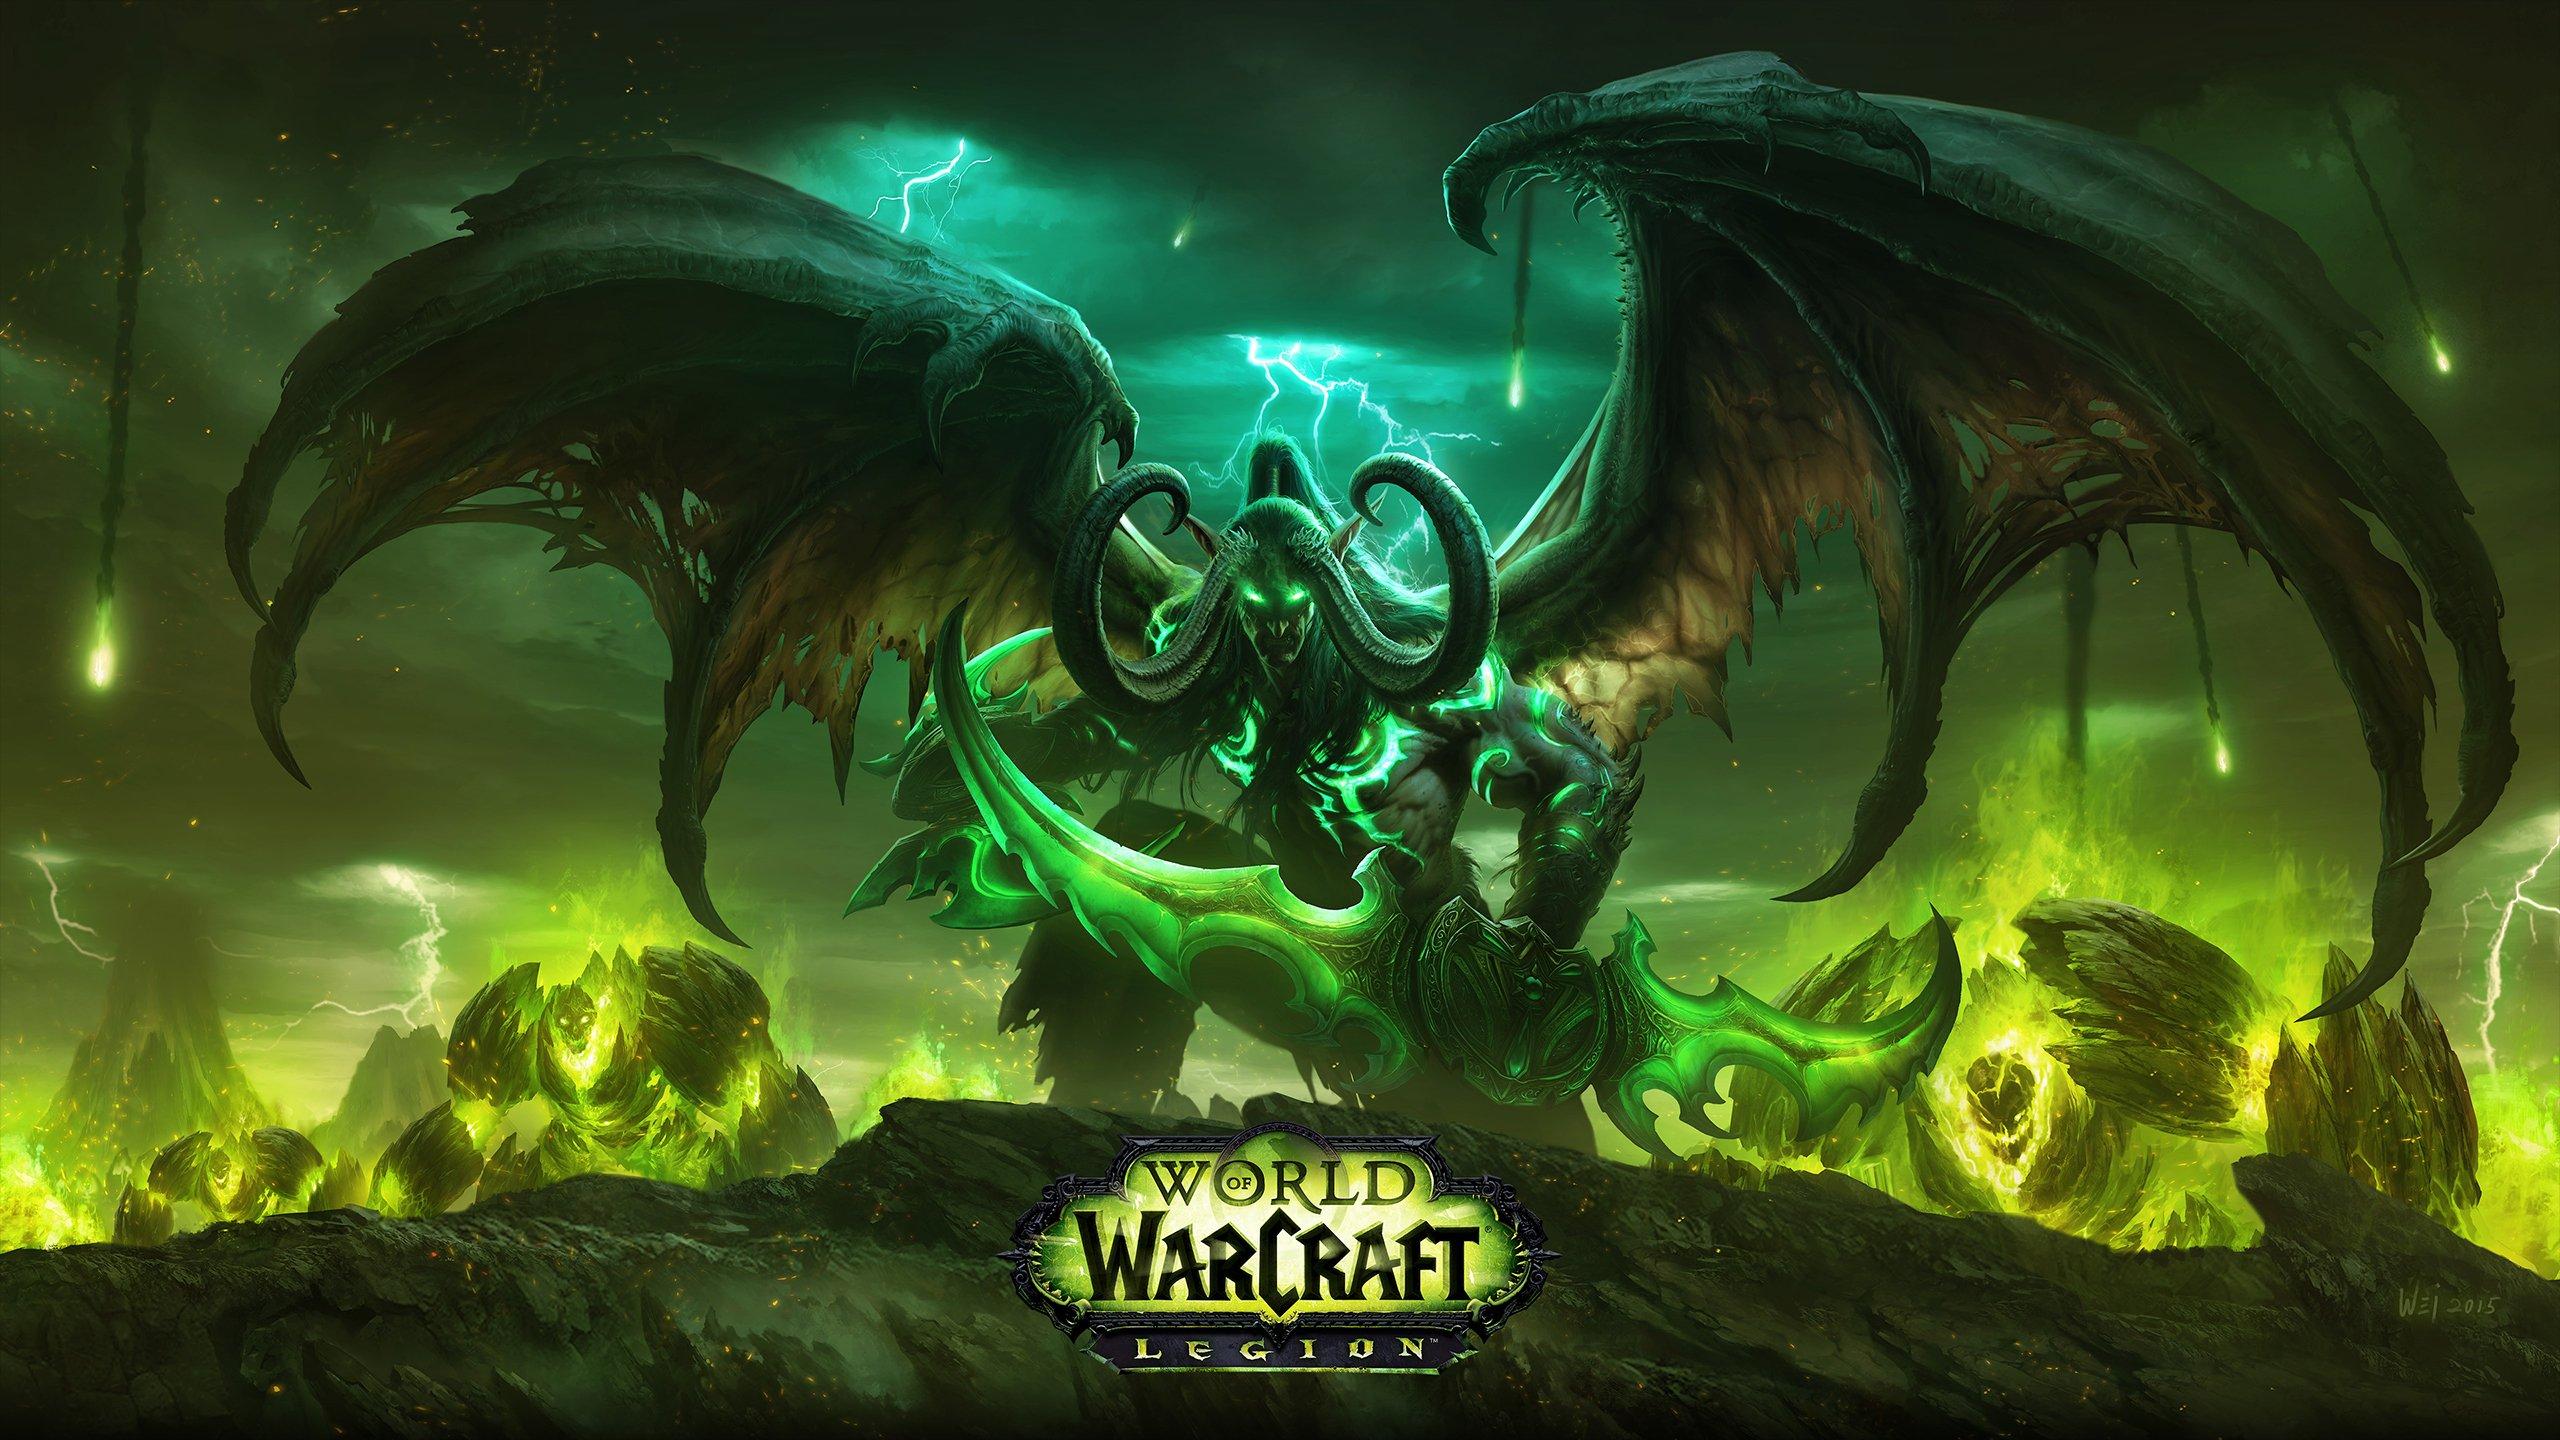 World of Warcraft [cinematic] - Изображение 1